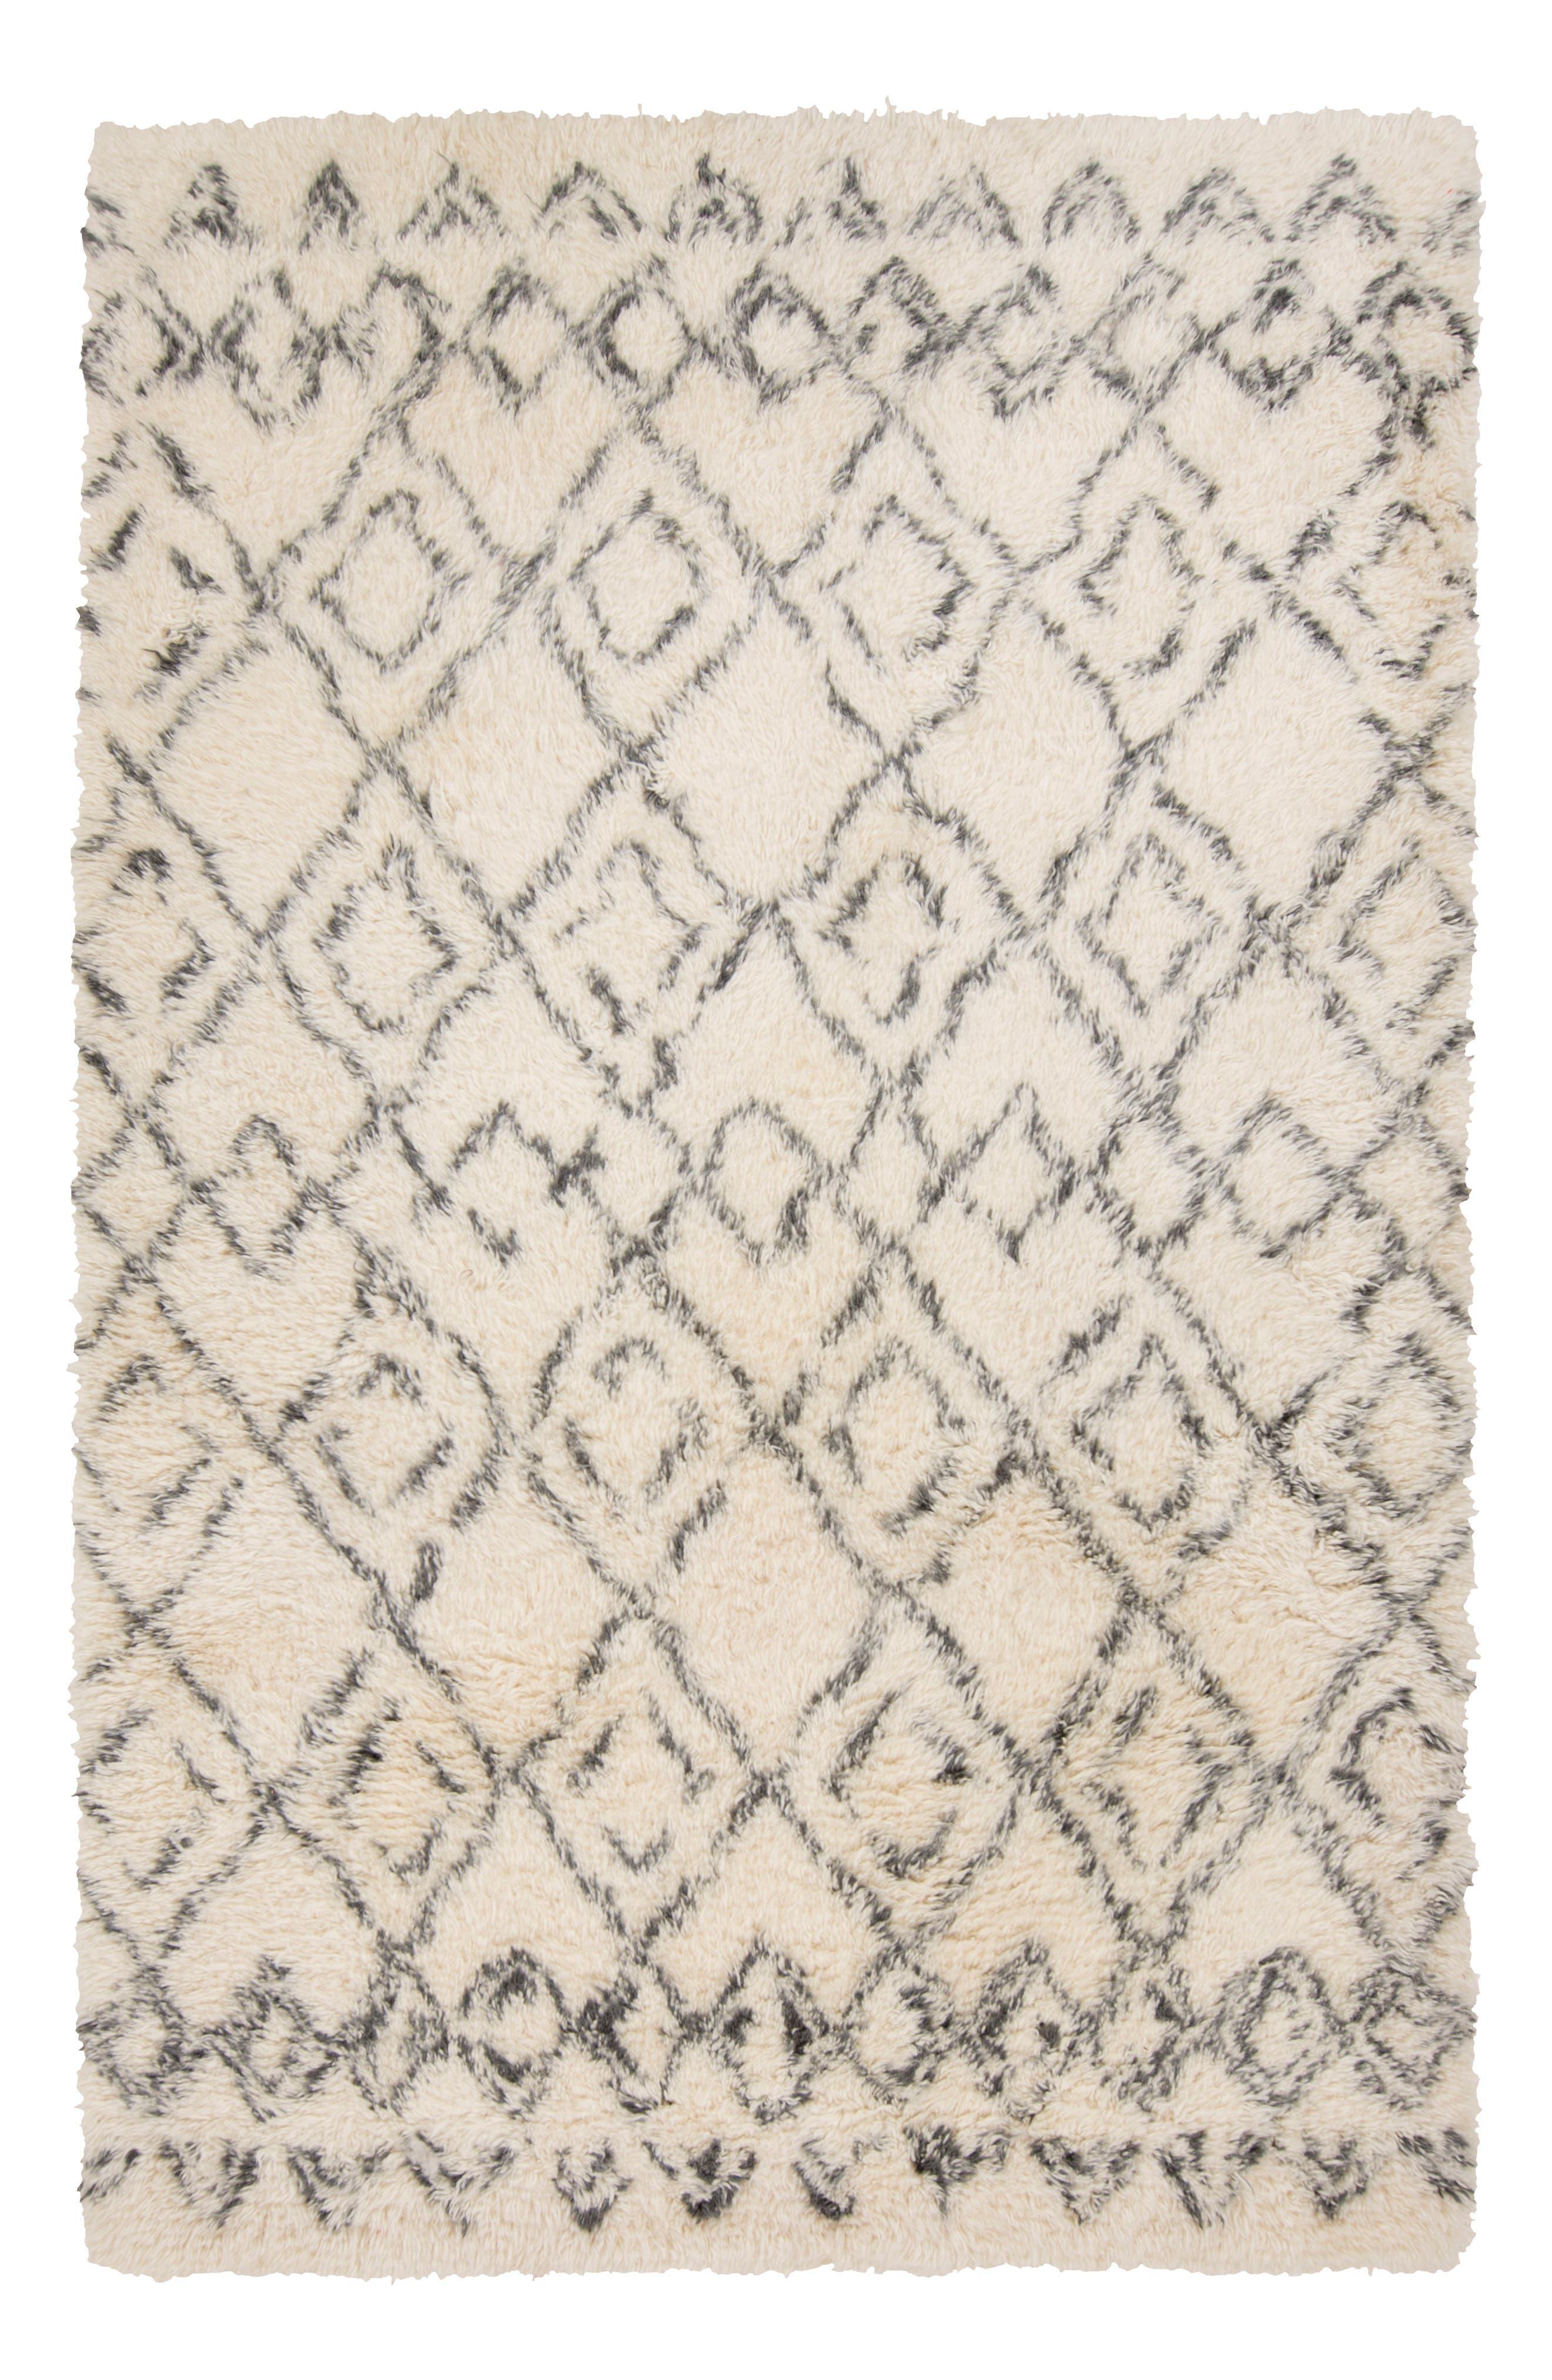 'Tasman' New Zealand Wool Rug,                             Alternate thumbnail 5, color,                             IVORY/ CHARCOAL